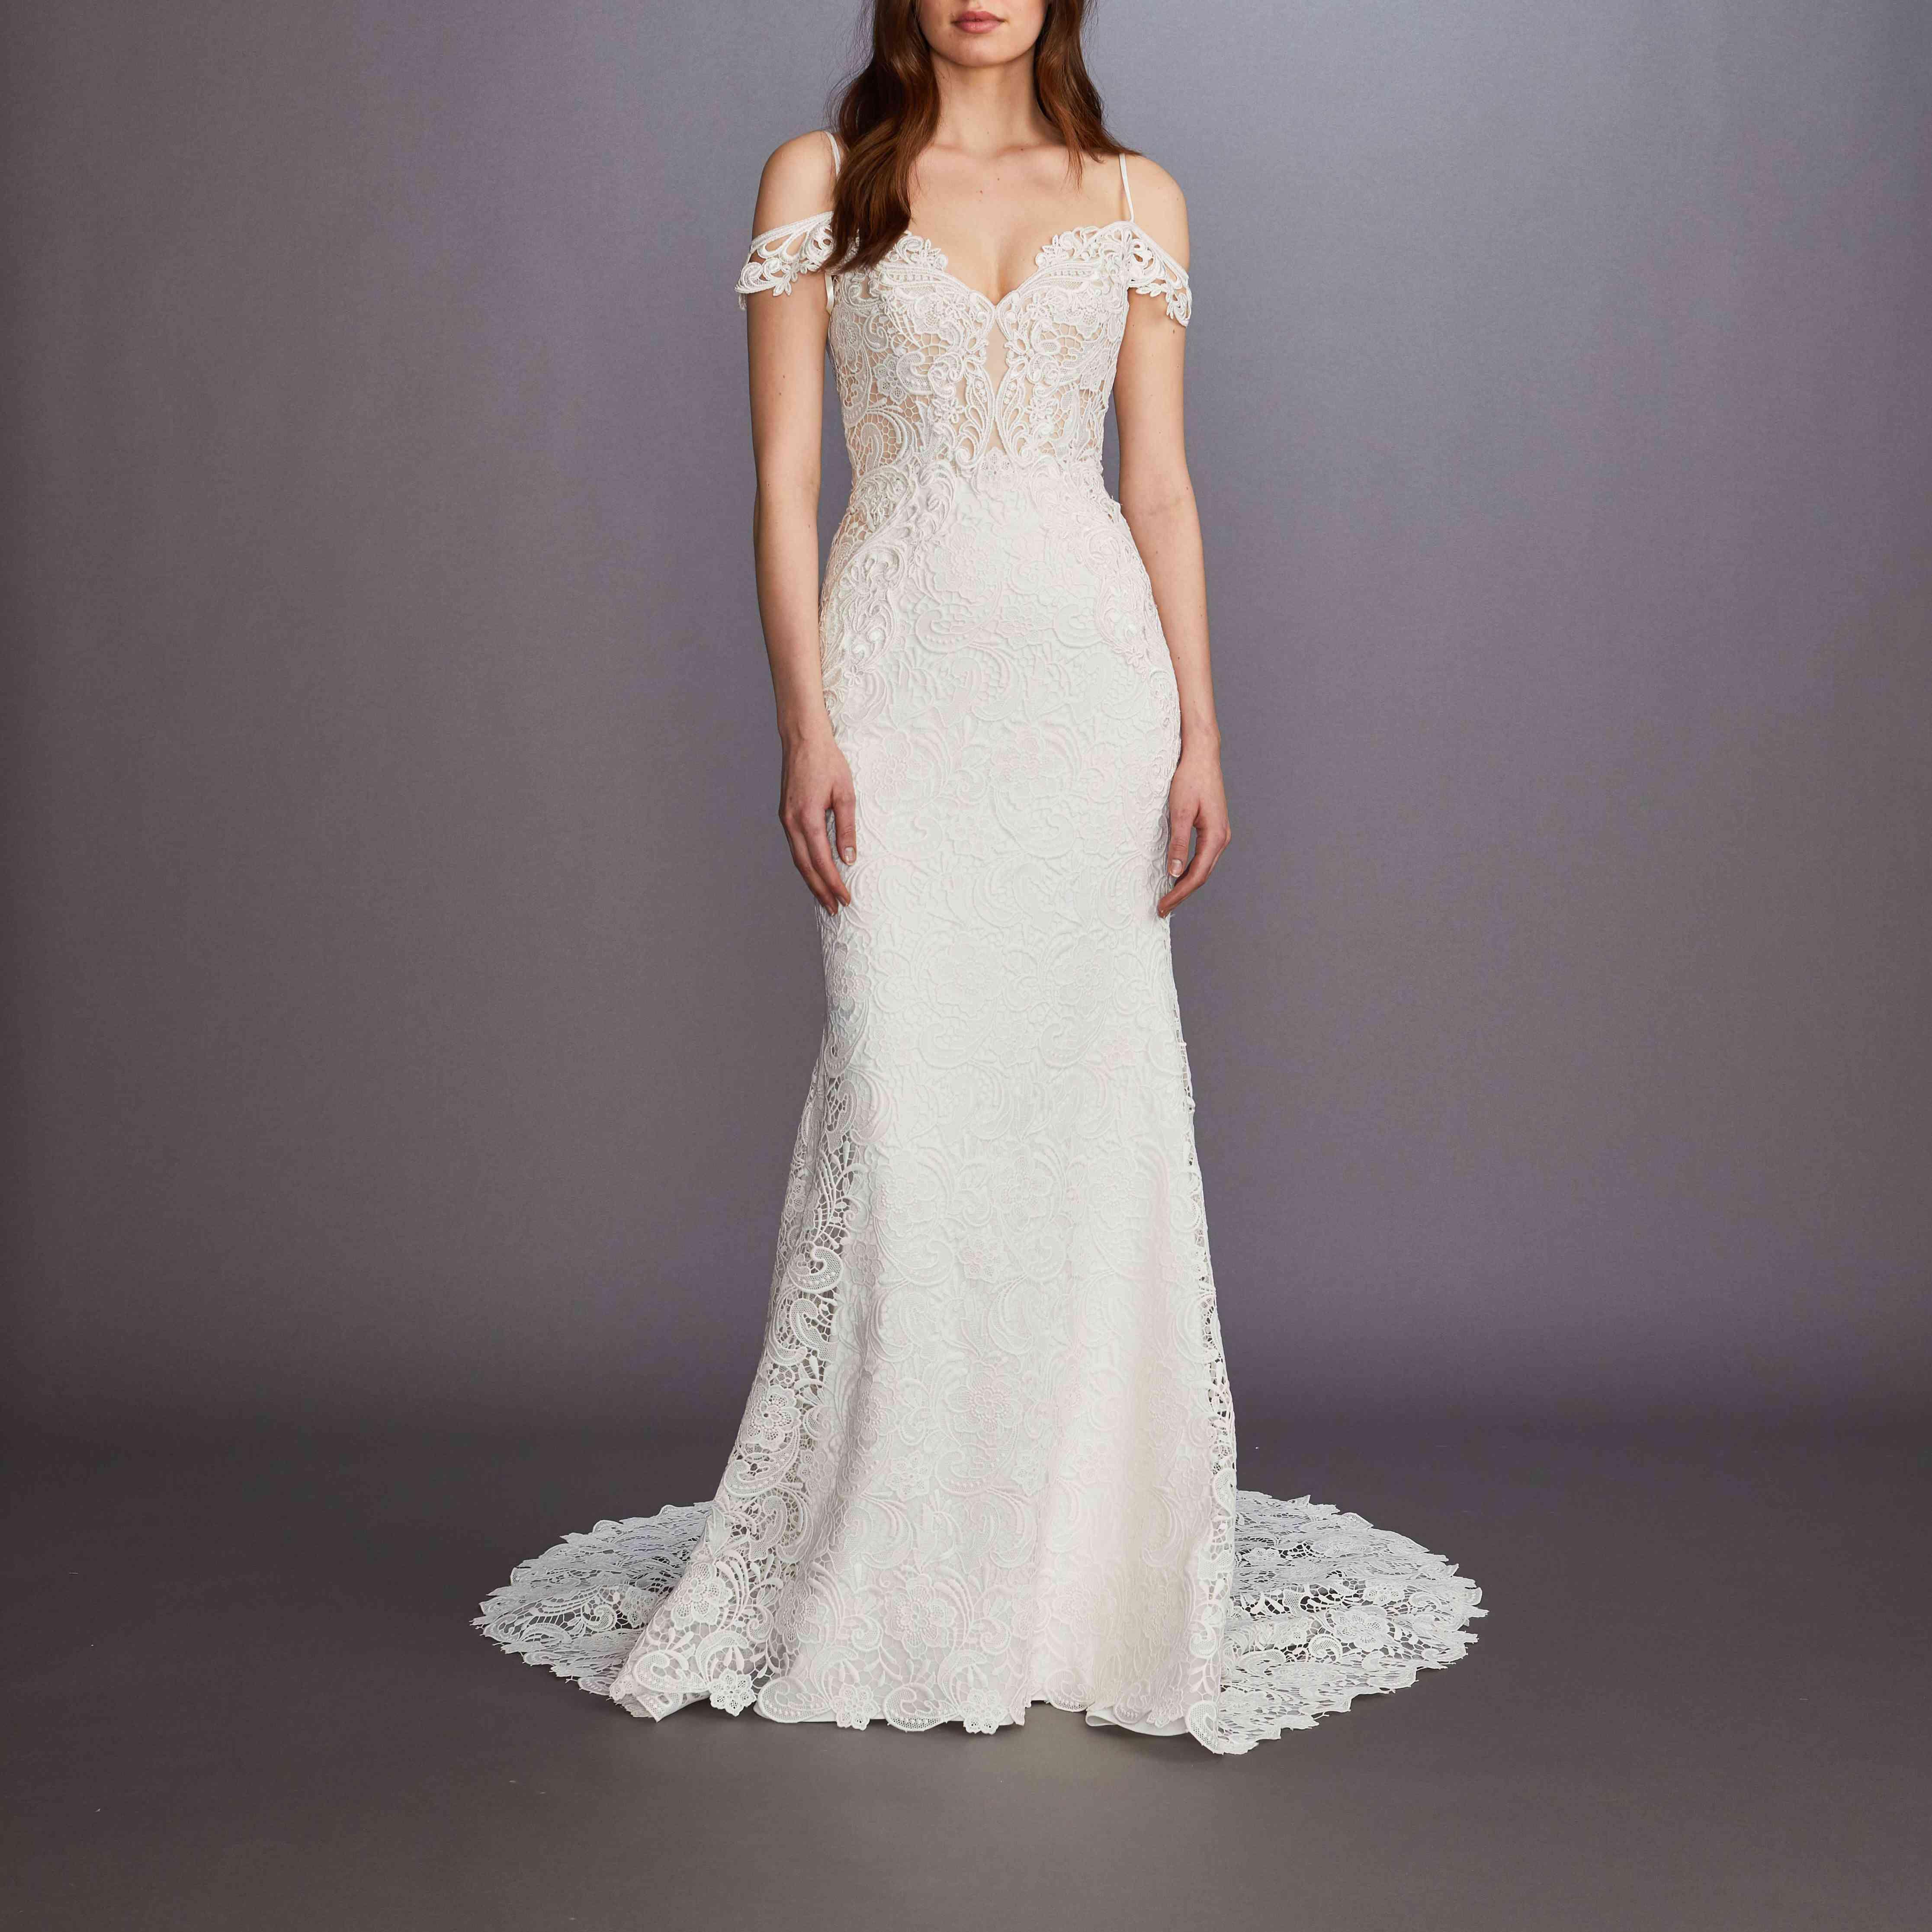 Hanna off-the-shoulder wedding dress by Lazaro